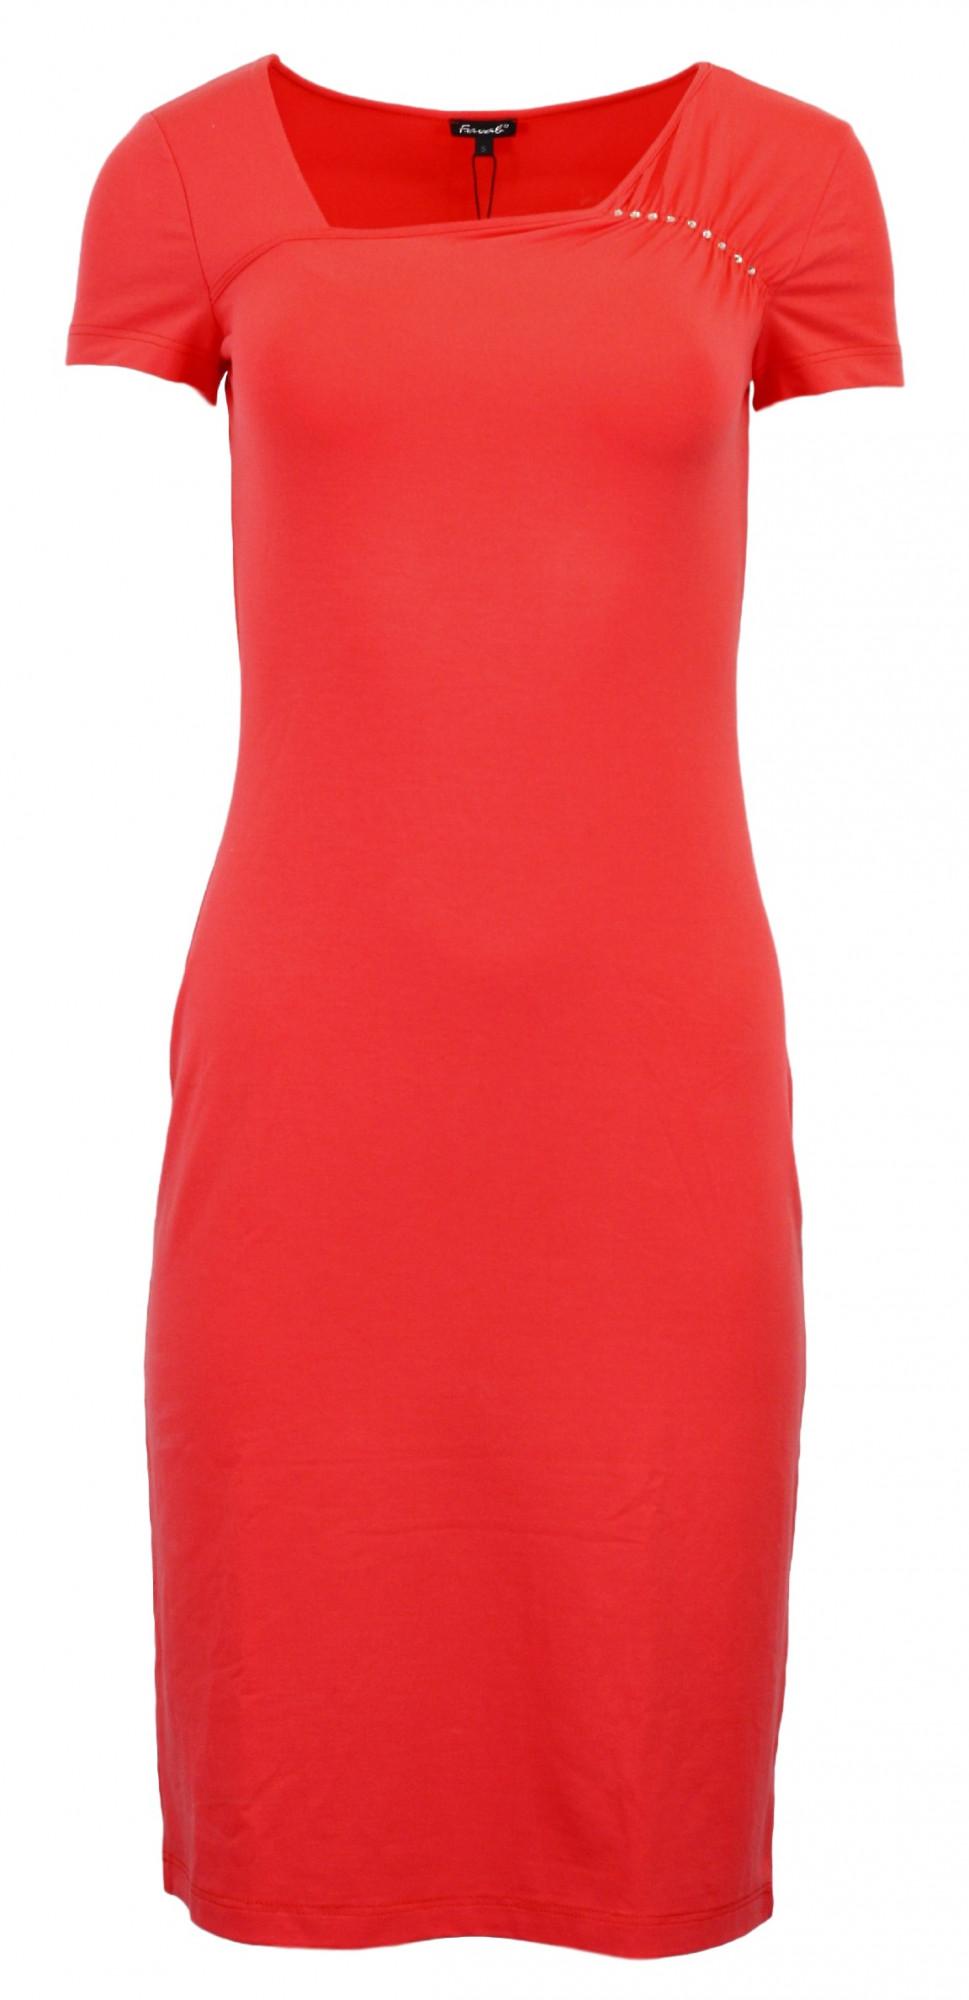 Dámské šaty Geta - Favab Barva: korálová, Velikost: S